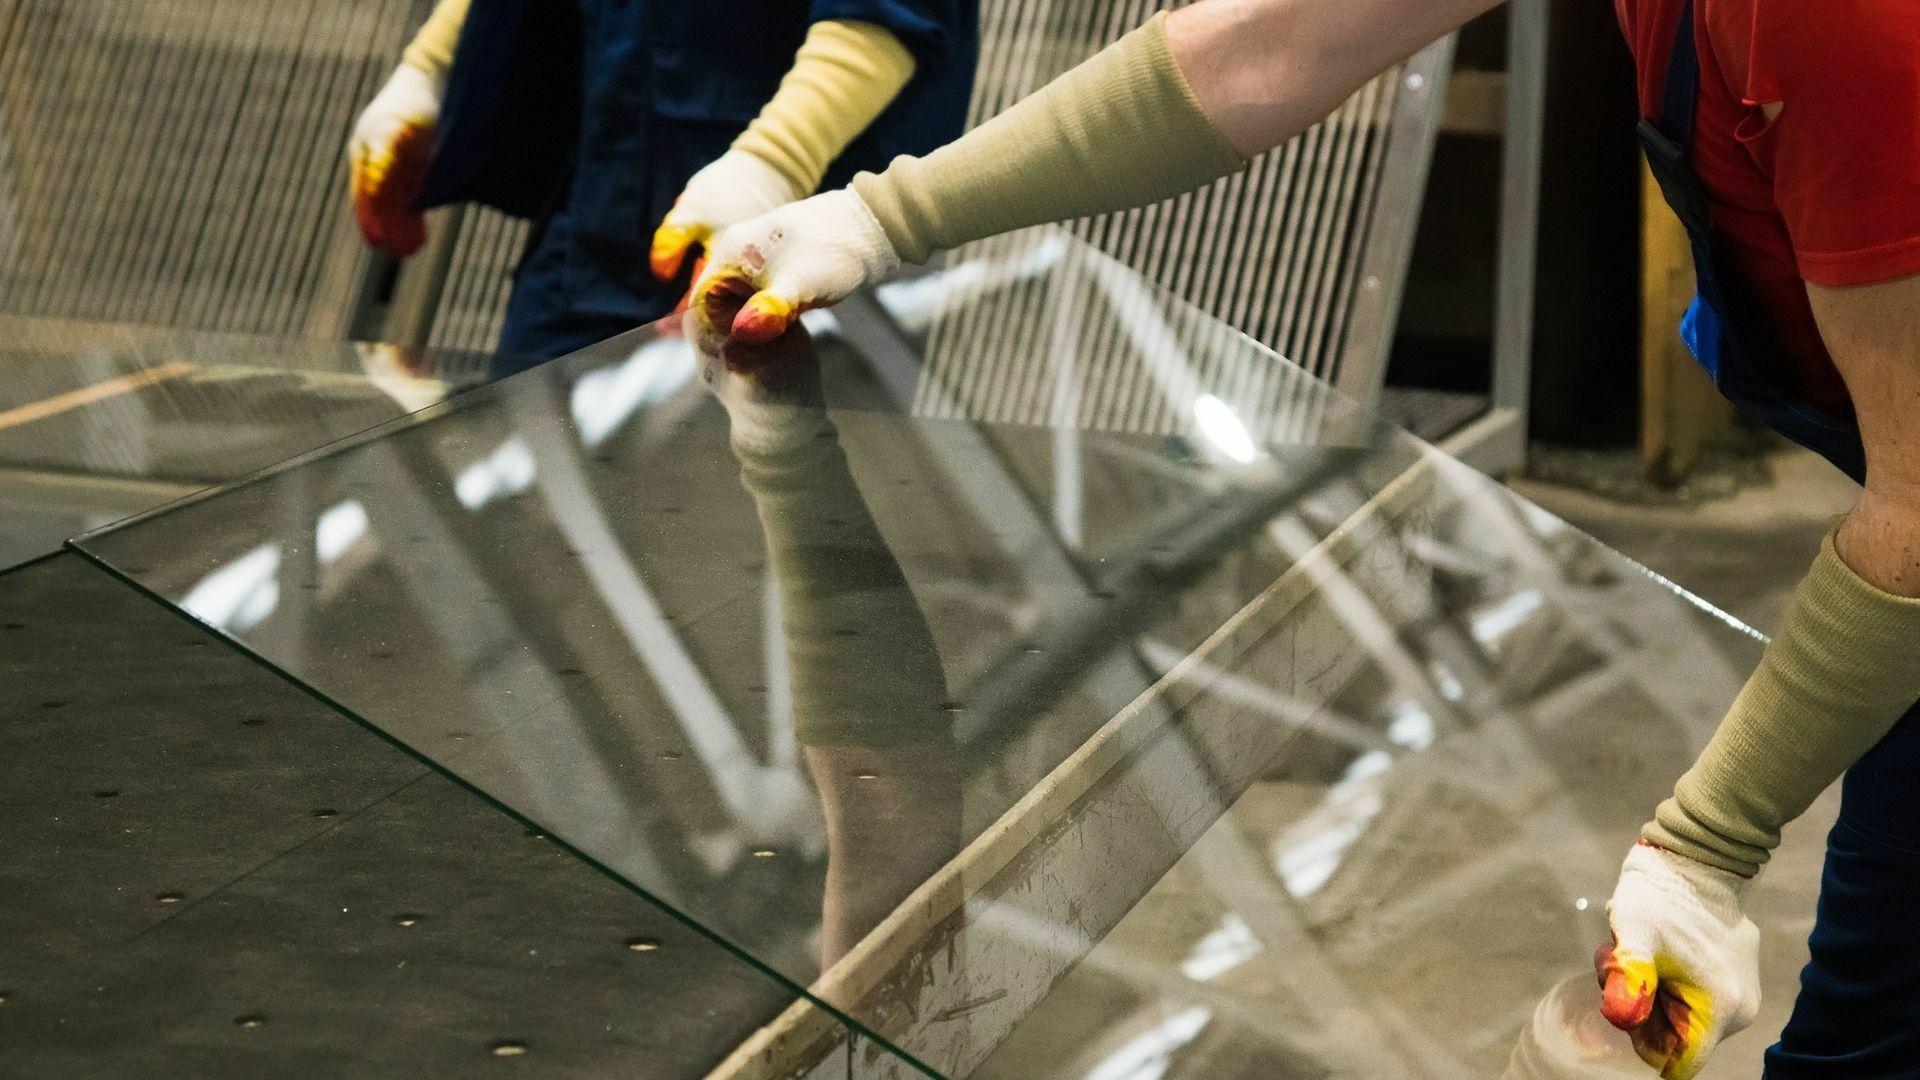 【Tochigi, Mooka】Work in the manufacture of glass fiber products!